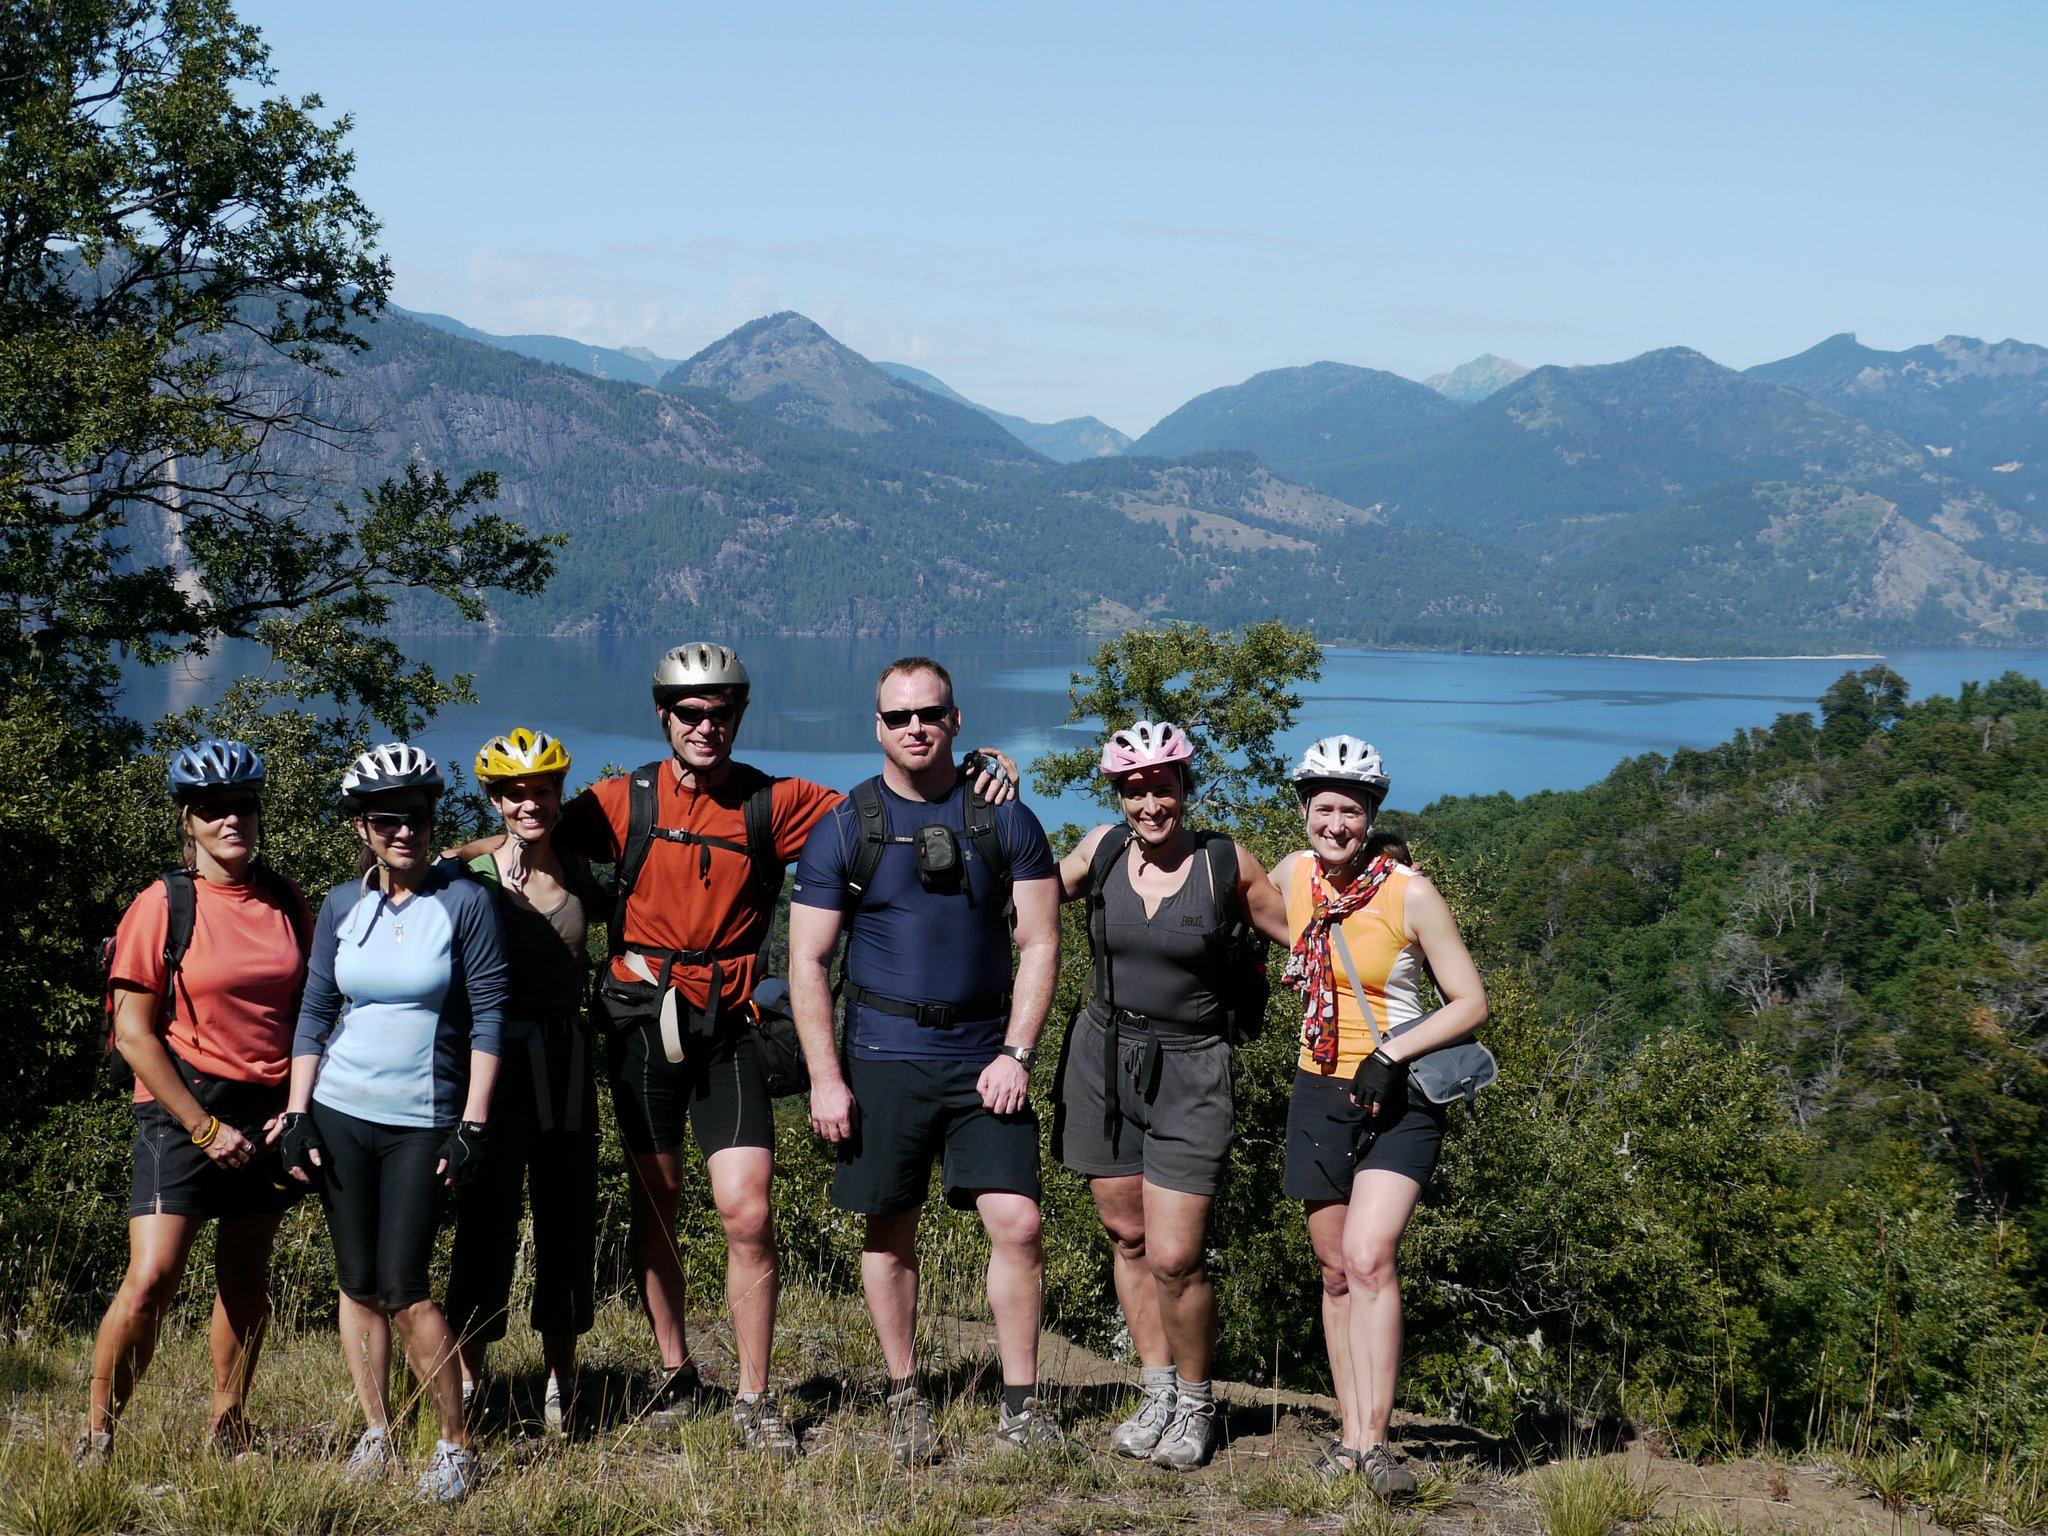 Taking a break from biking in Patagonia